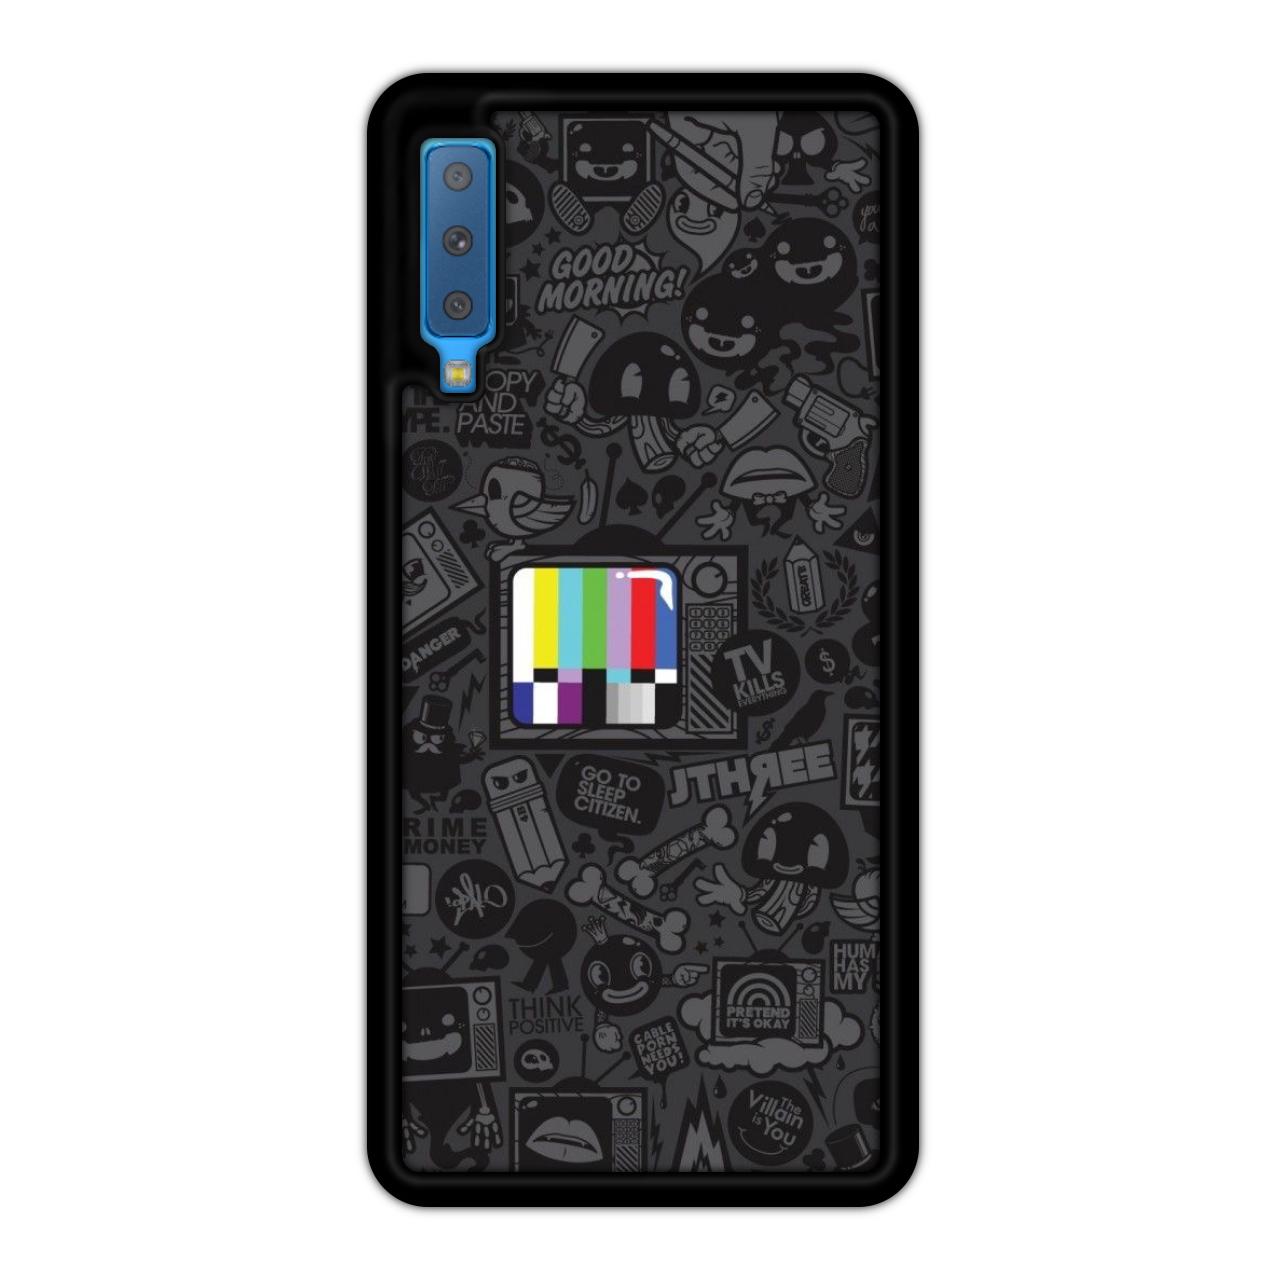 کاور آکام مدل Aa70078 مناسب برای گوشی موبایل سامسونگ Galaxy A7 2018